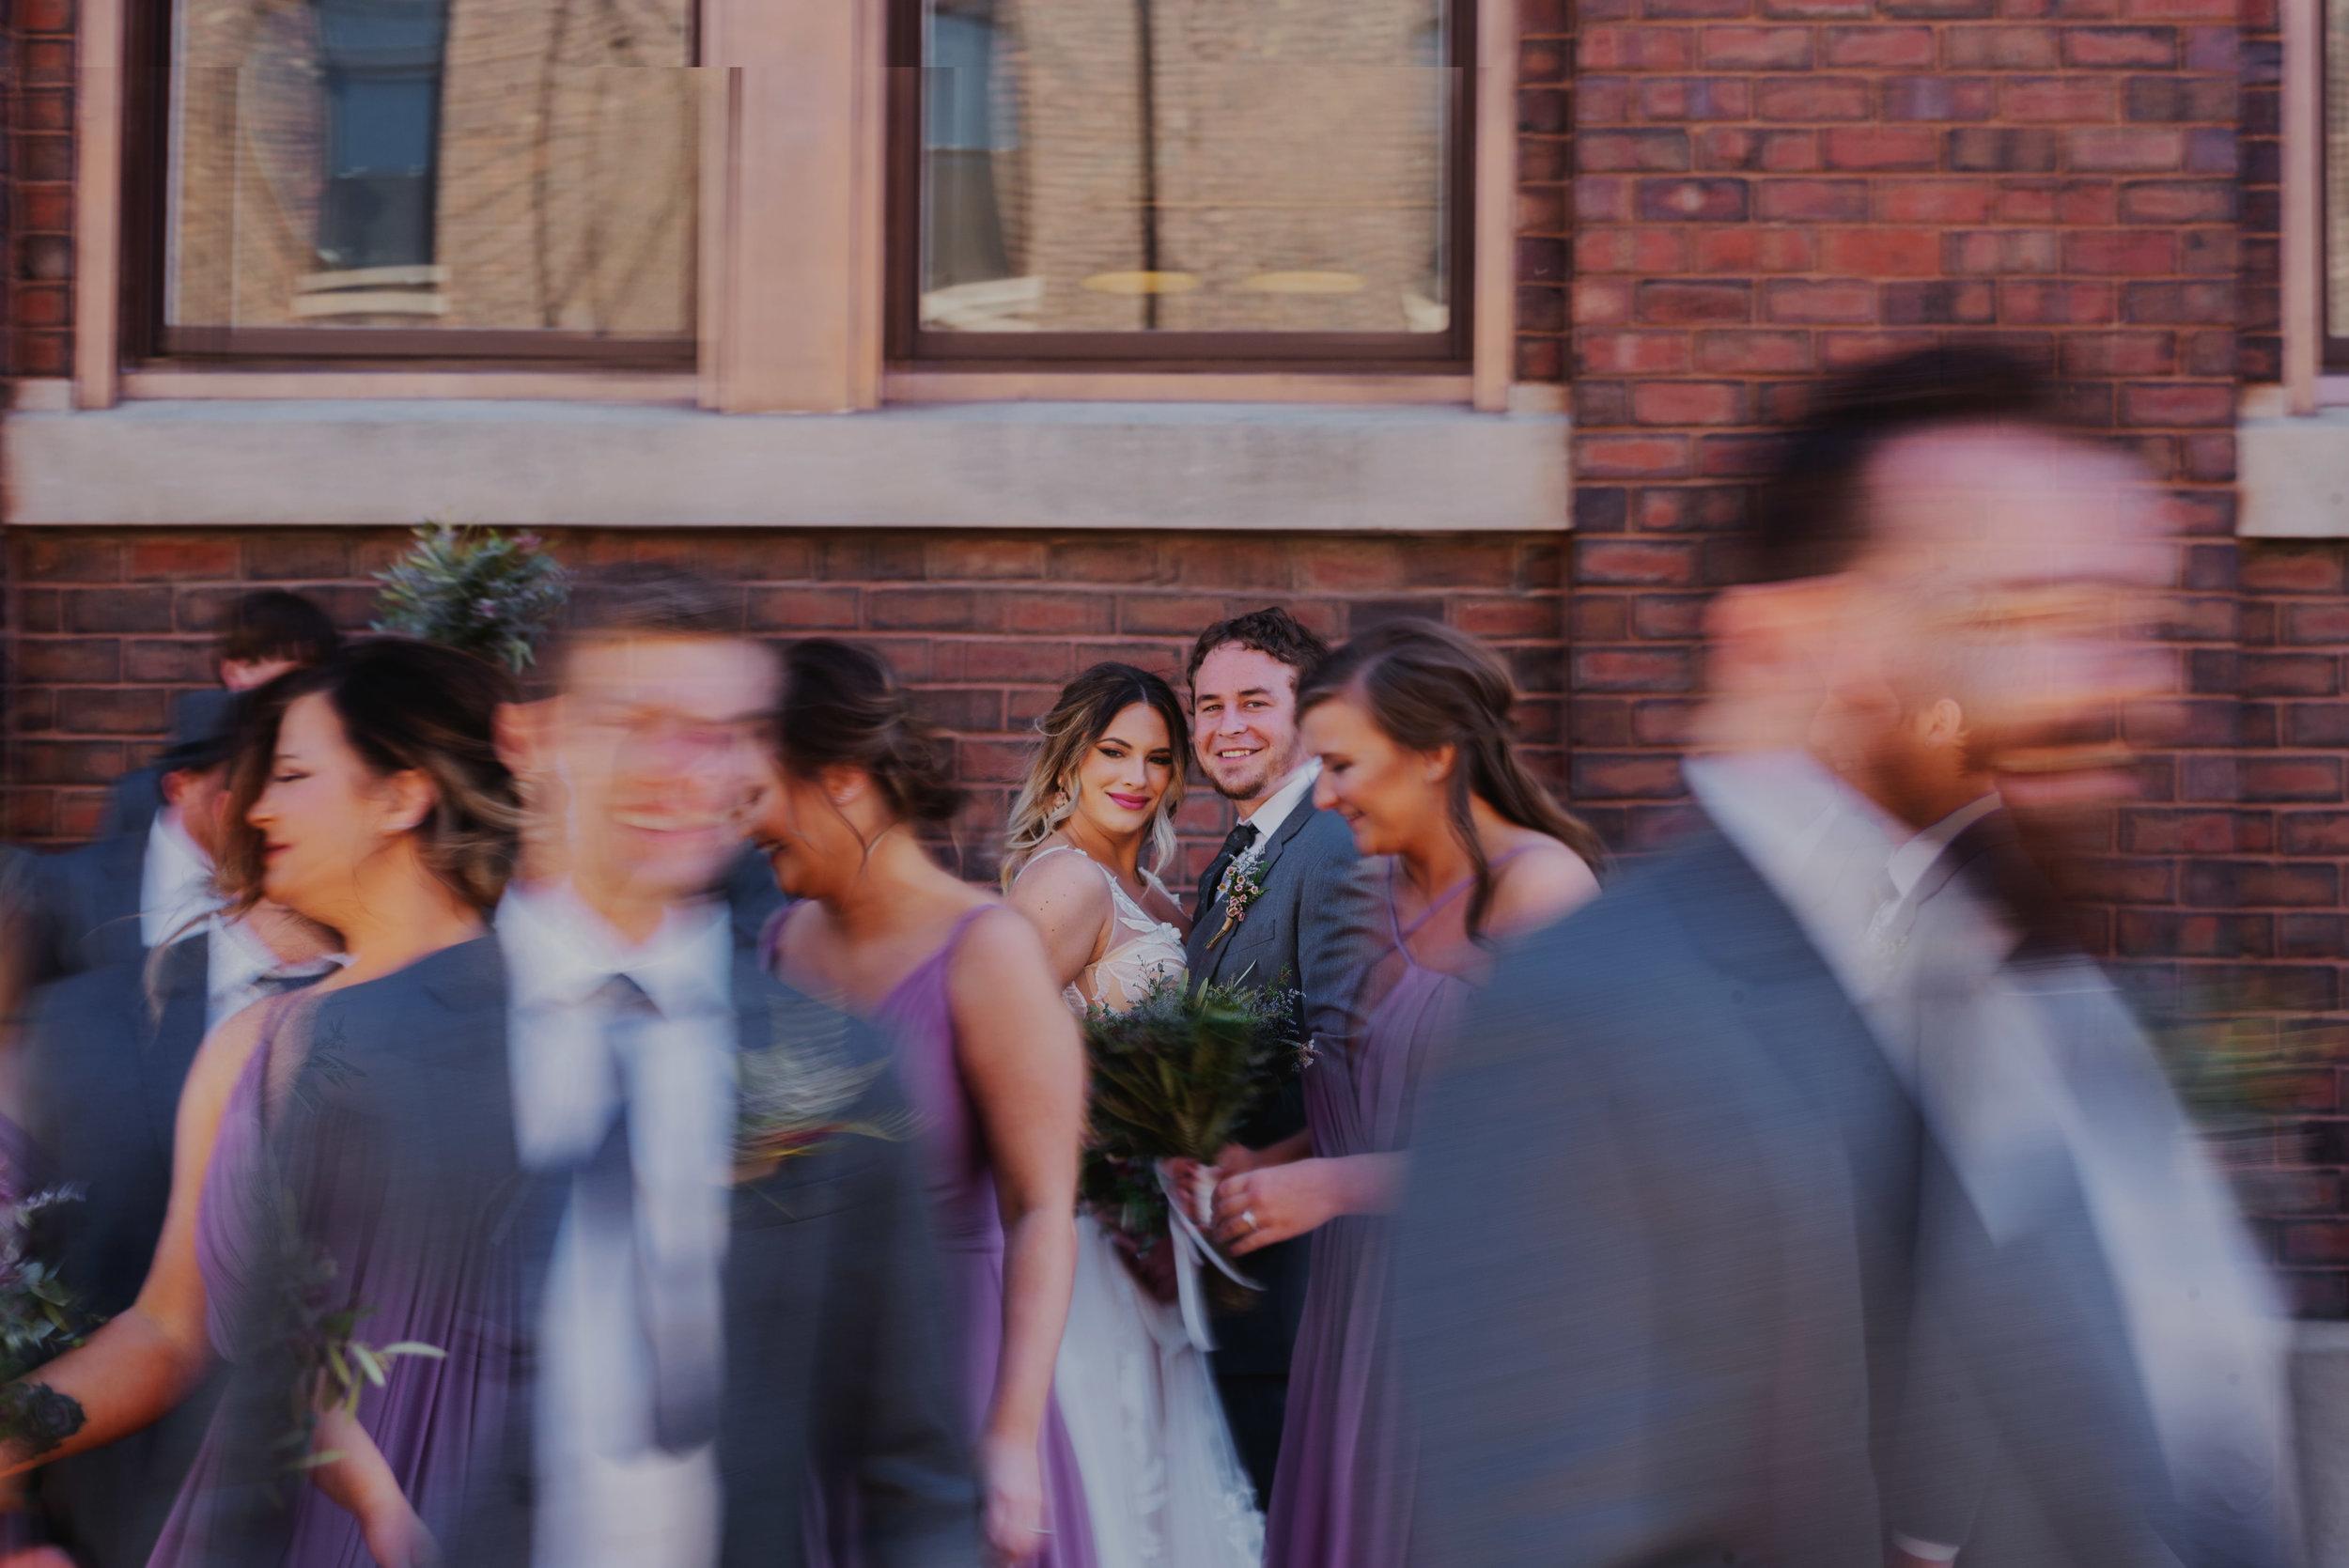 Benckendor-TheSilverFox-Streator-Wedding_0105.jpg